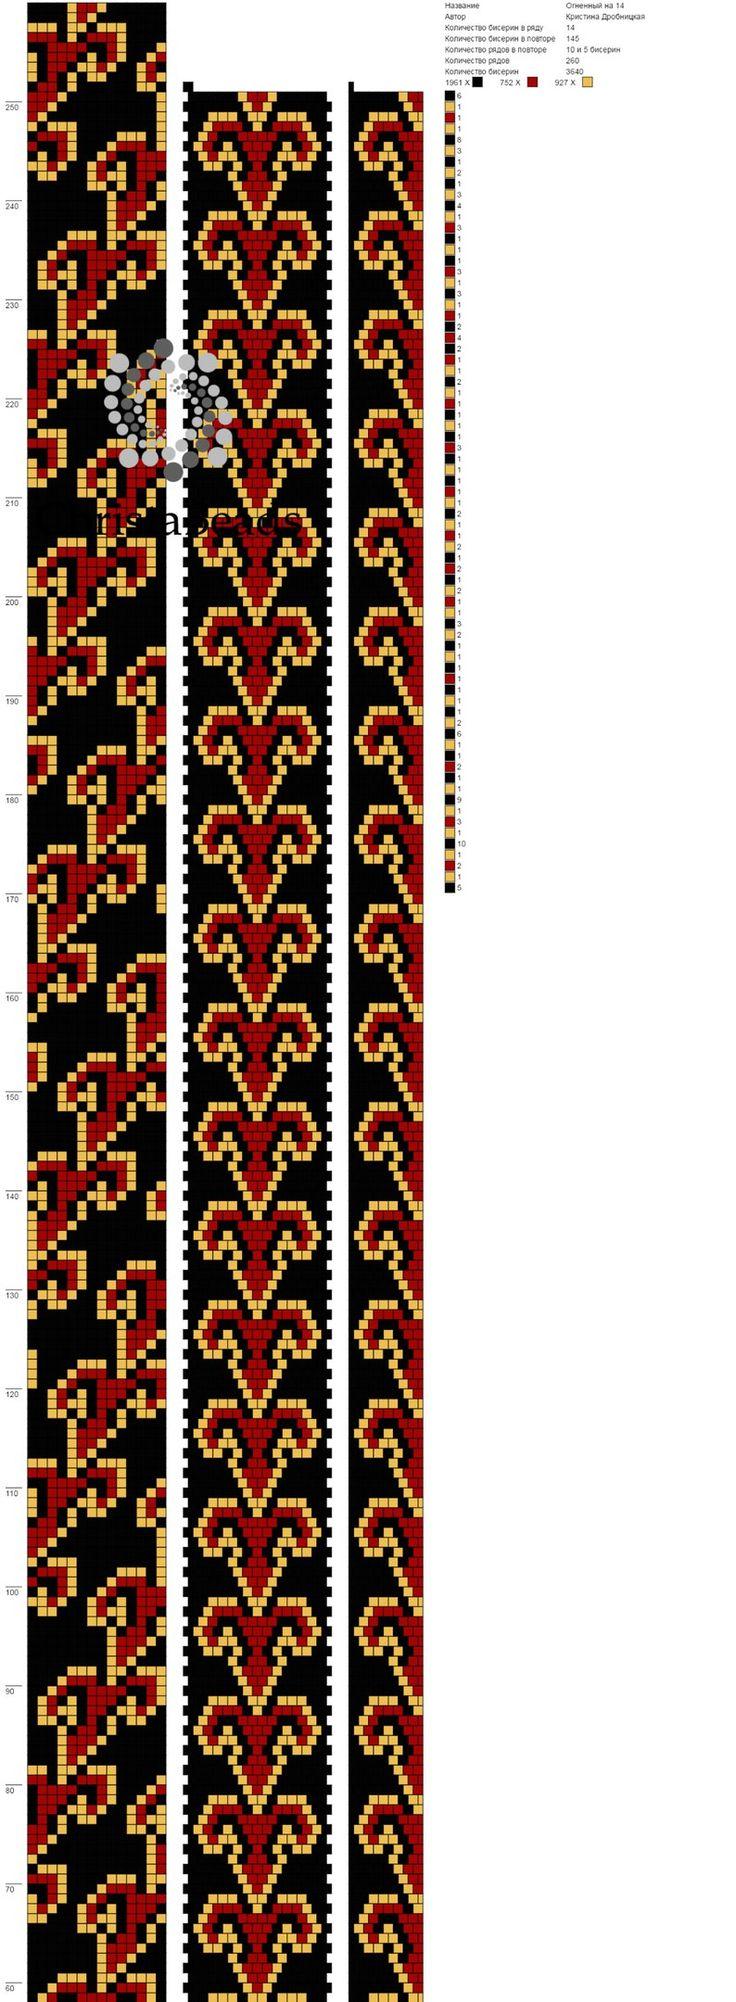 MGWiZliOM-k.jpg (794×2160)